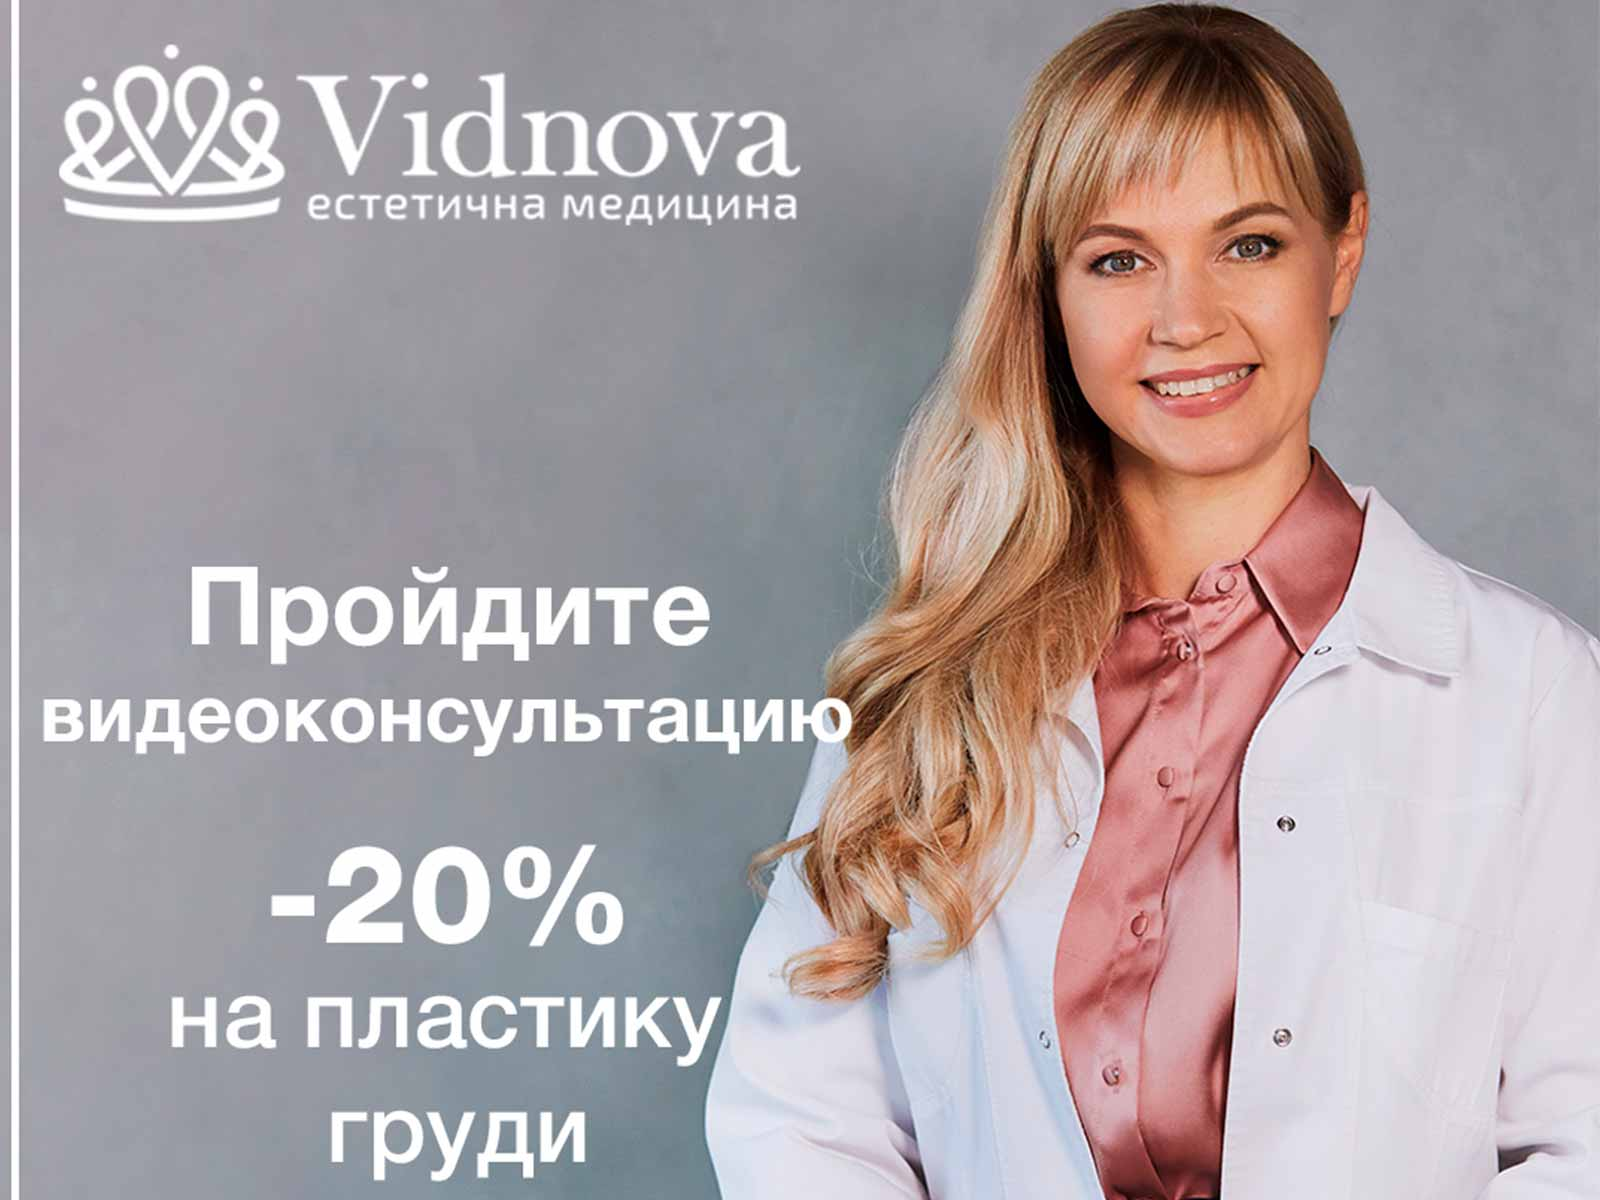 Скидка 20% на пластику груди от пластического хирурга Светланы Работенко, фото